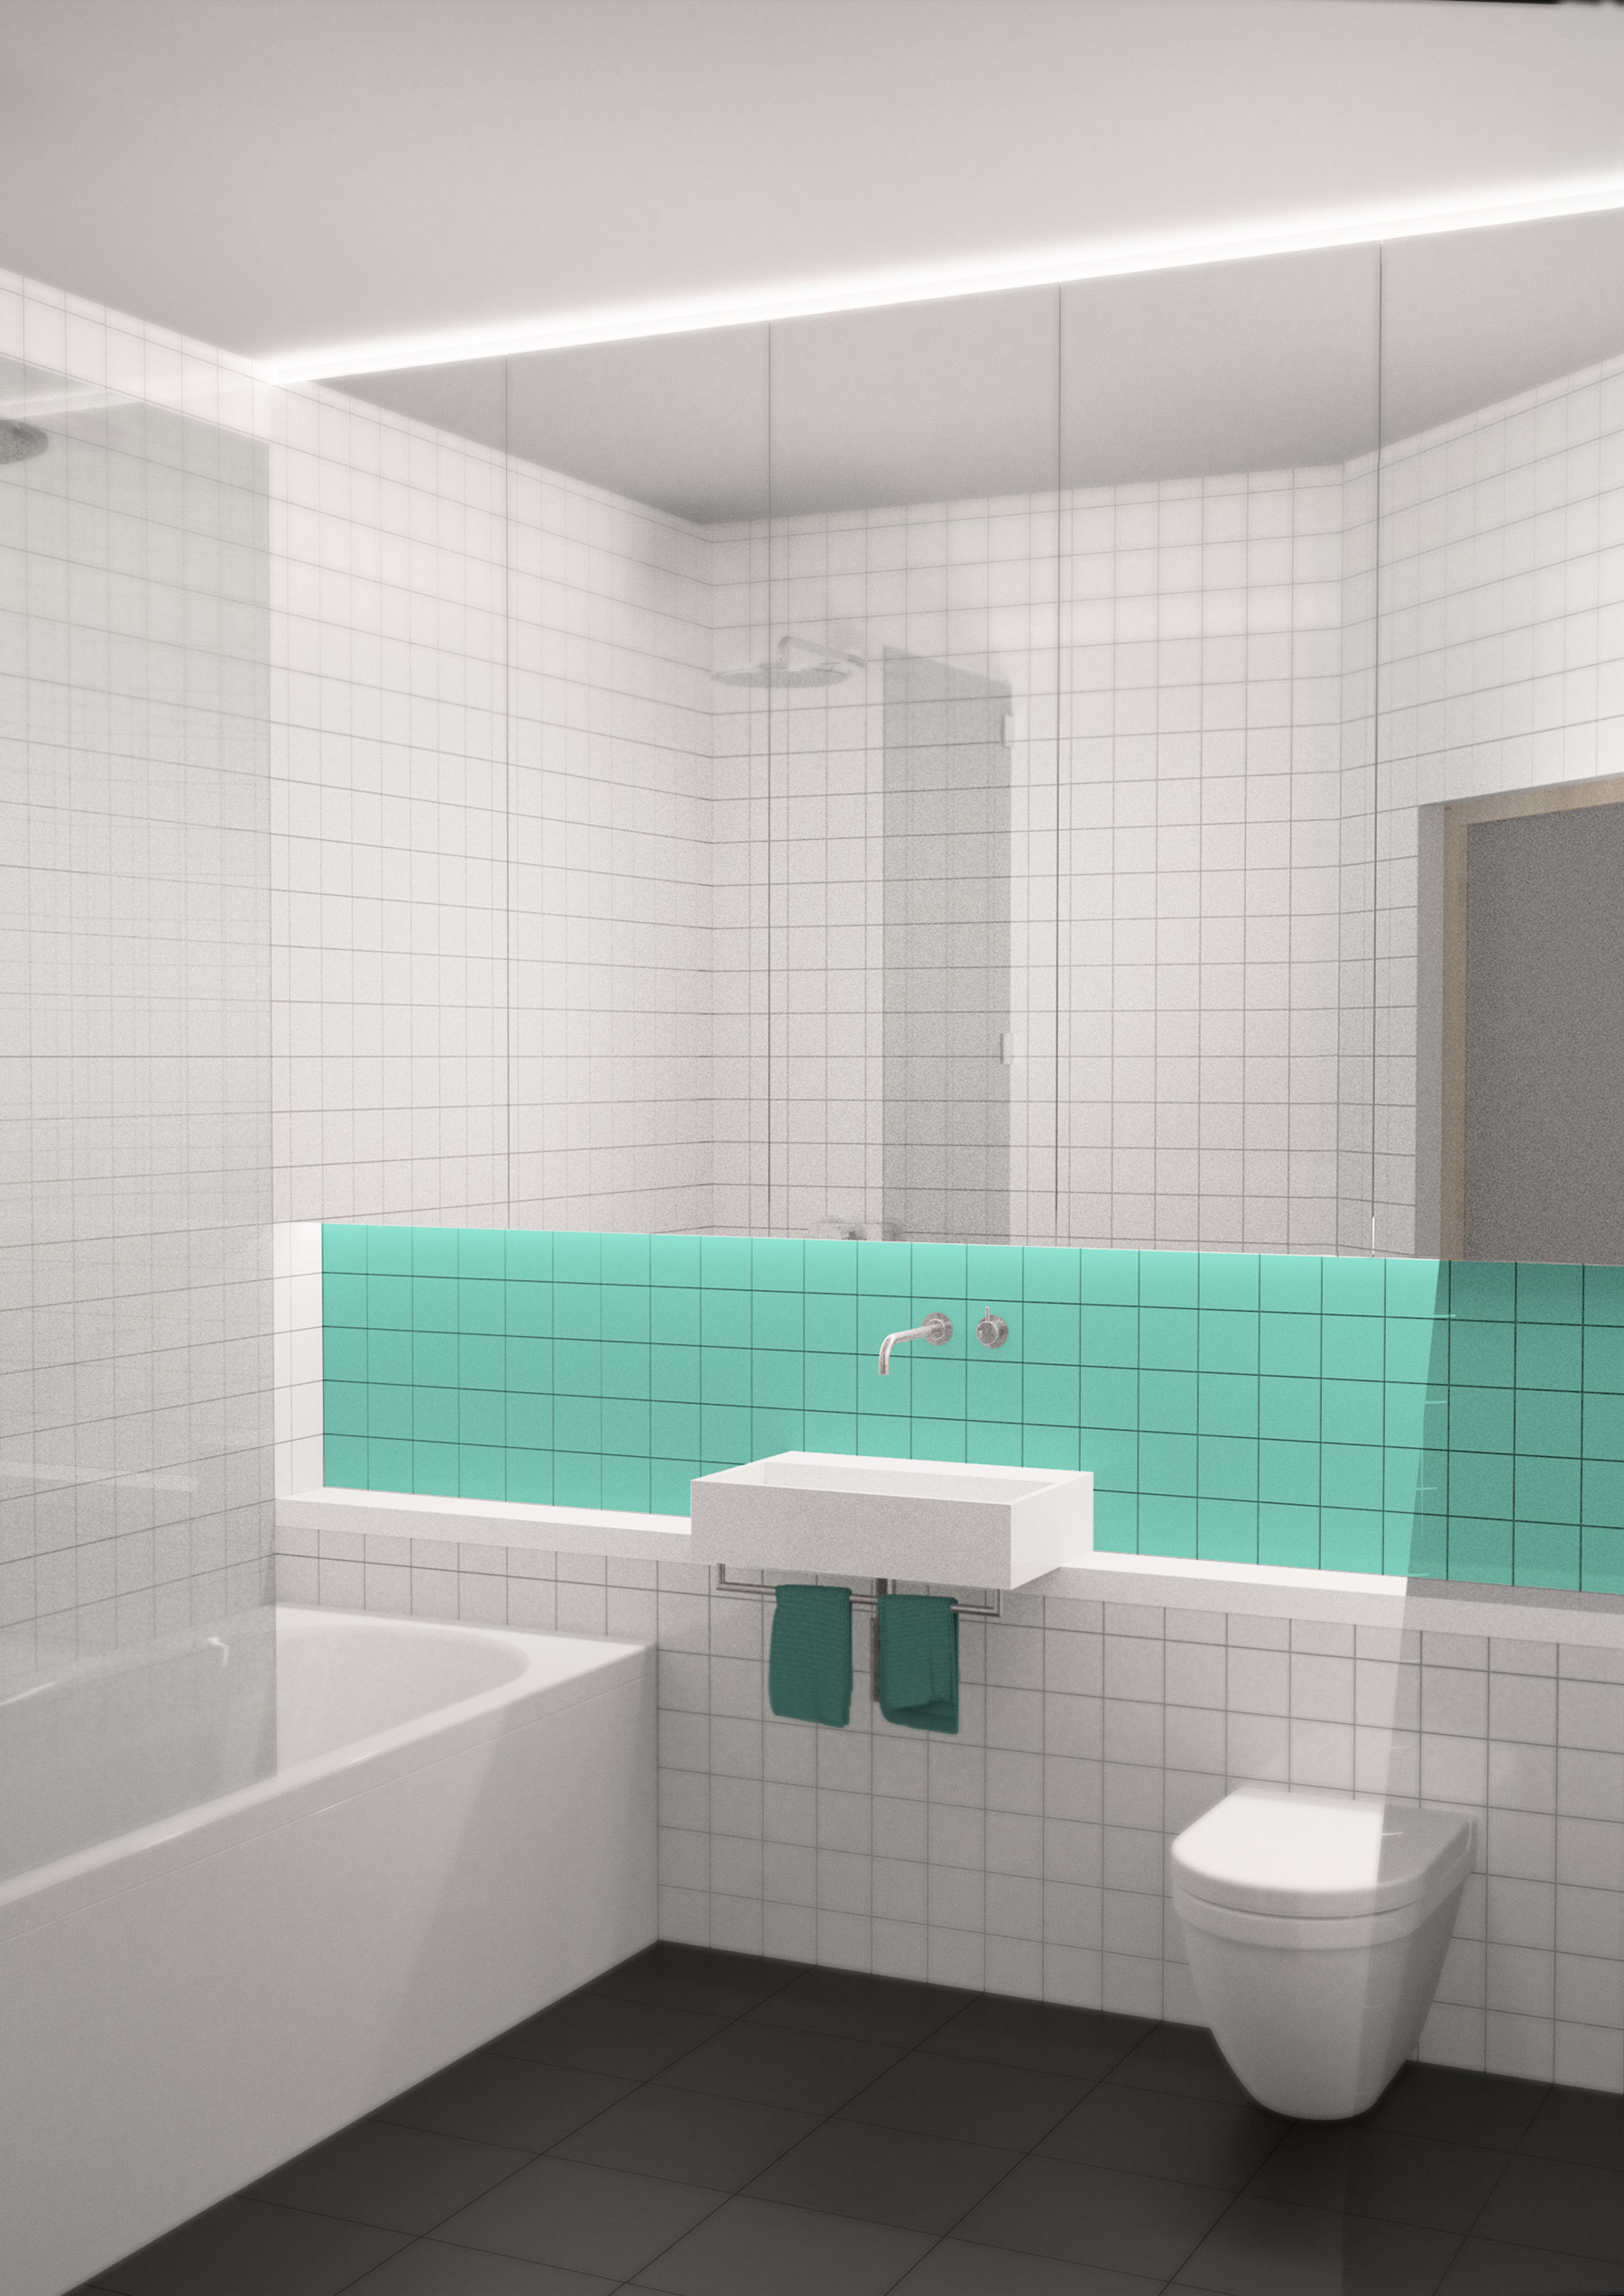 170209_Bathroom-Perspective.jpg